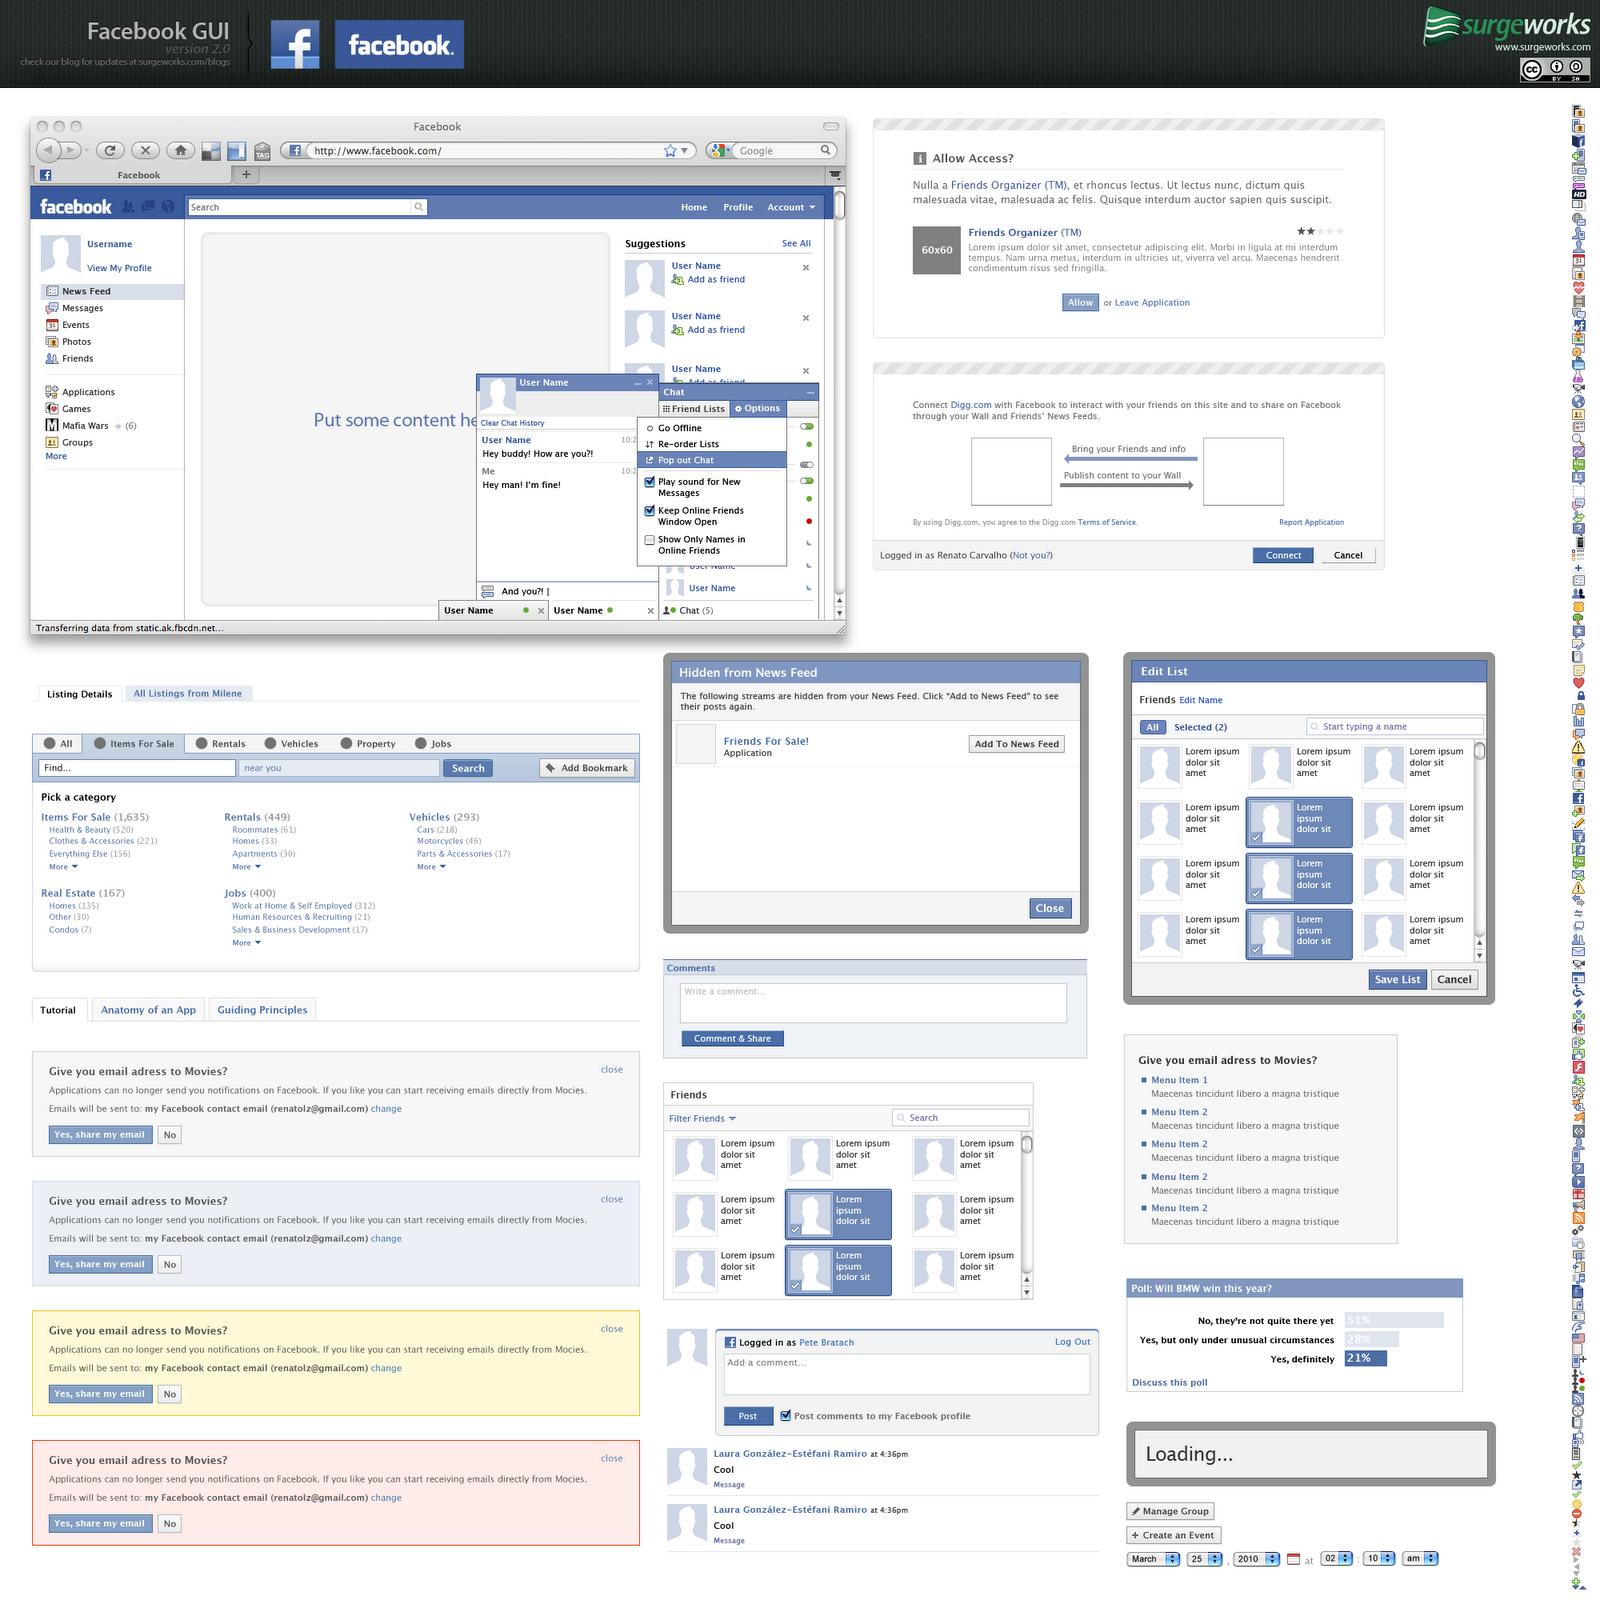 Free Full Layered Facebook GUI PSD Kit